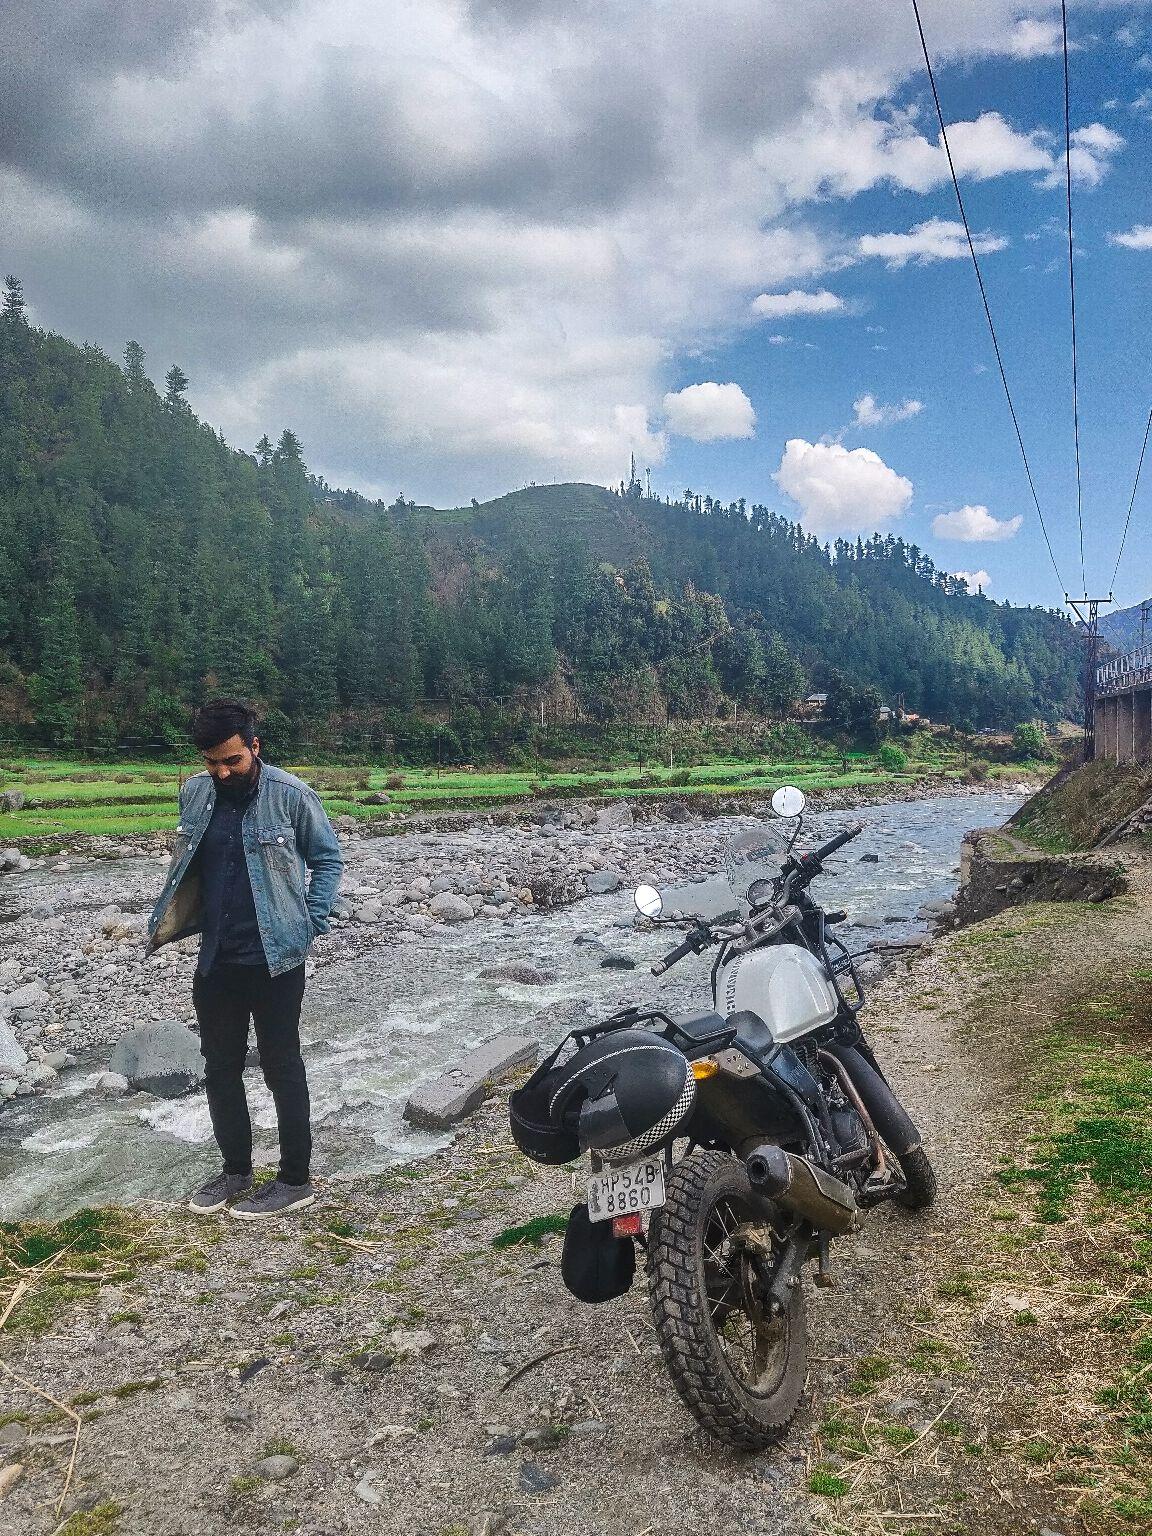 Photo of Bir Billing Paragliding By Sagar Dang